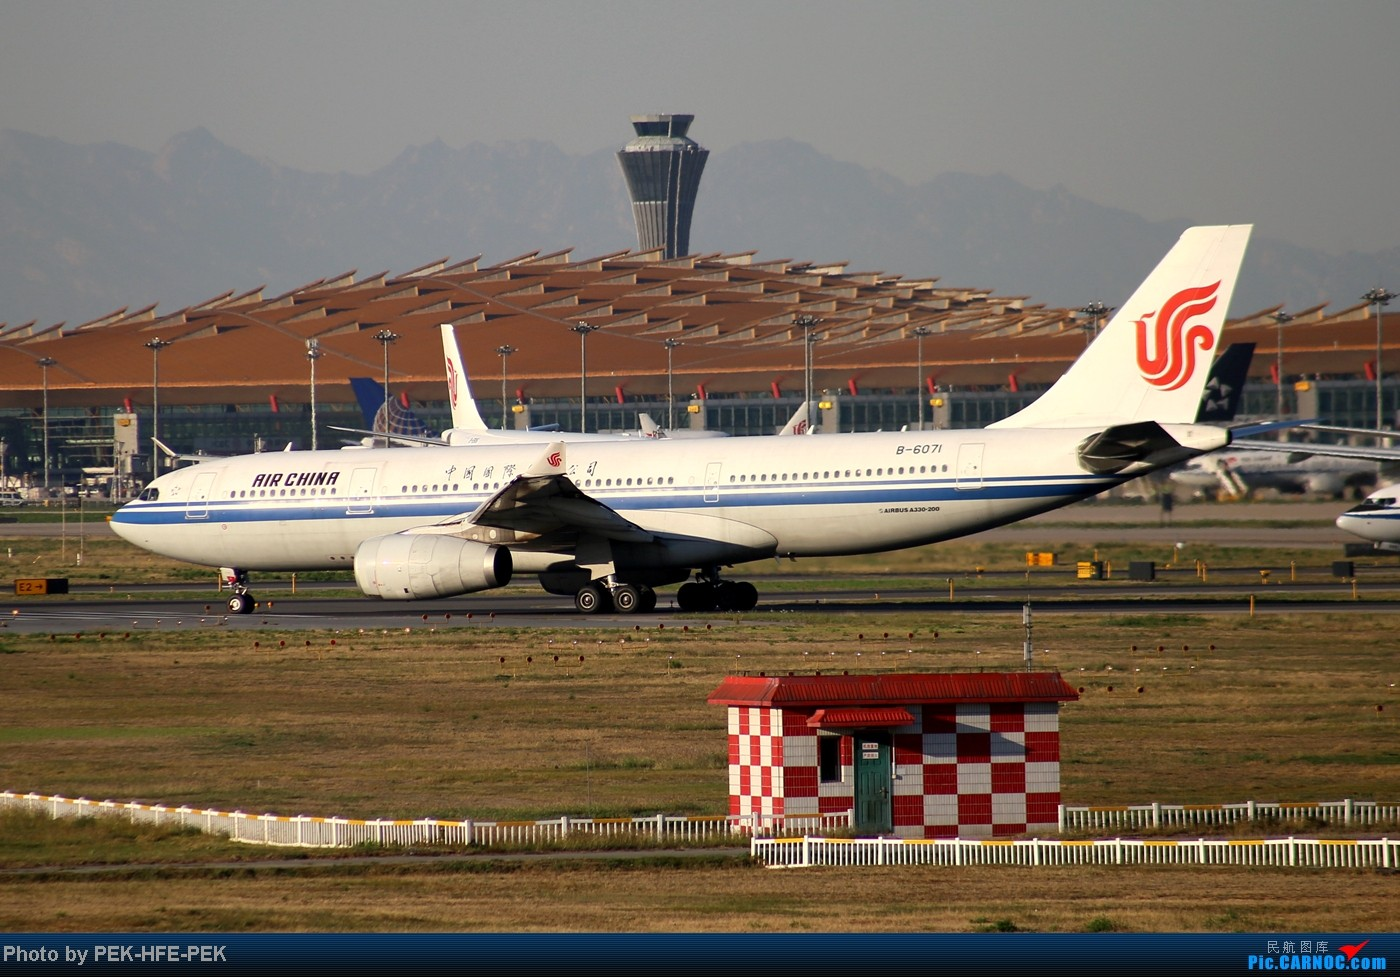 Re:[原创][AutumnKwok]趁apec假有时间把以前拍的图都发了~帝都巨好的天儿在八卦台拍的一组图 AIRBUS A330-200 B-6071